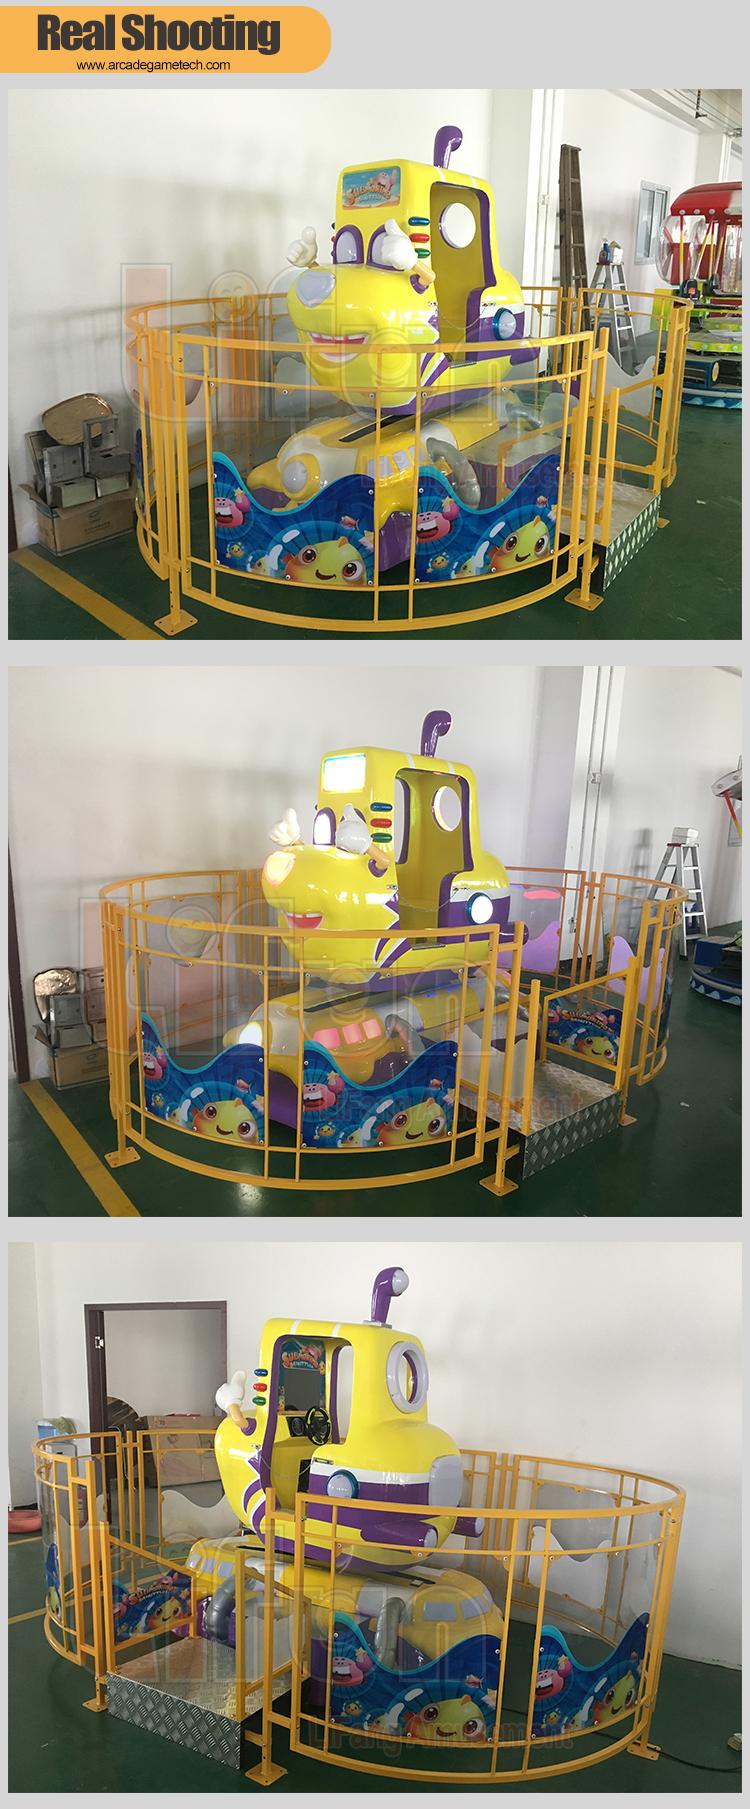 <Ocean Shuttle Kiddie Ride>